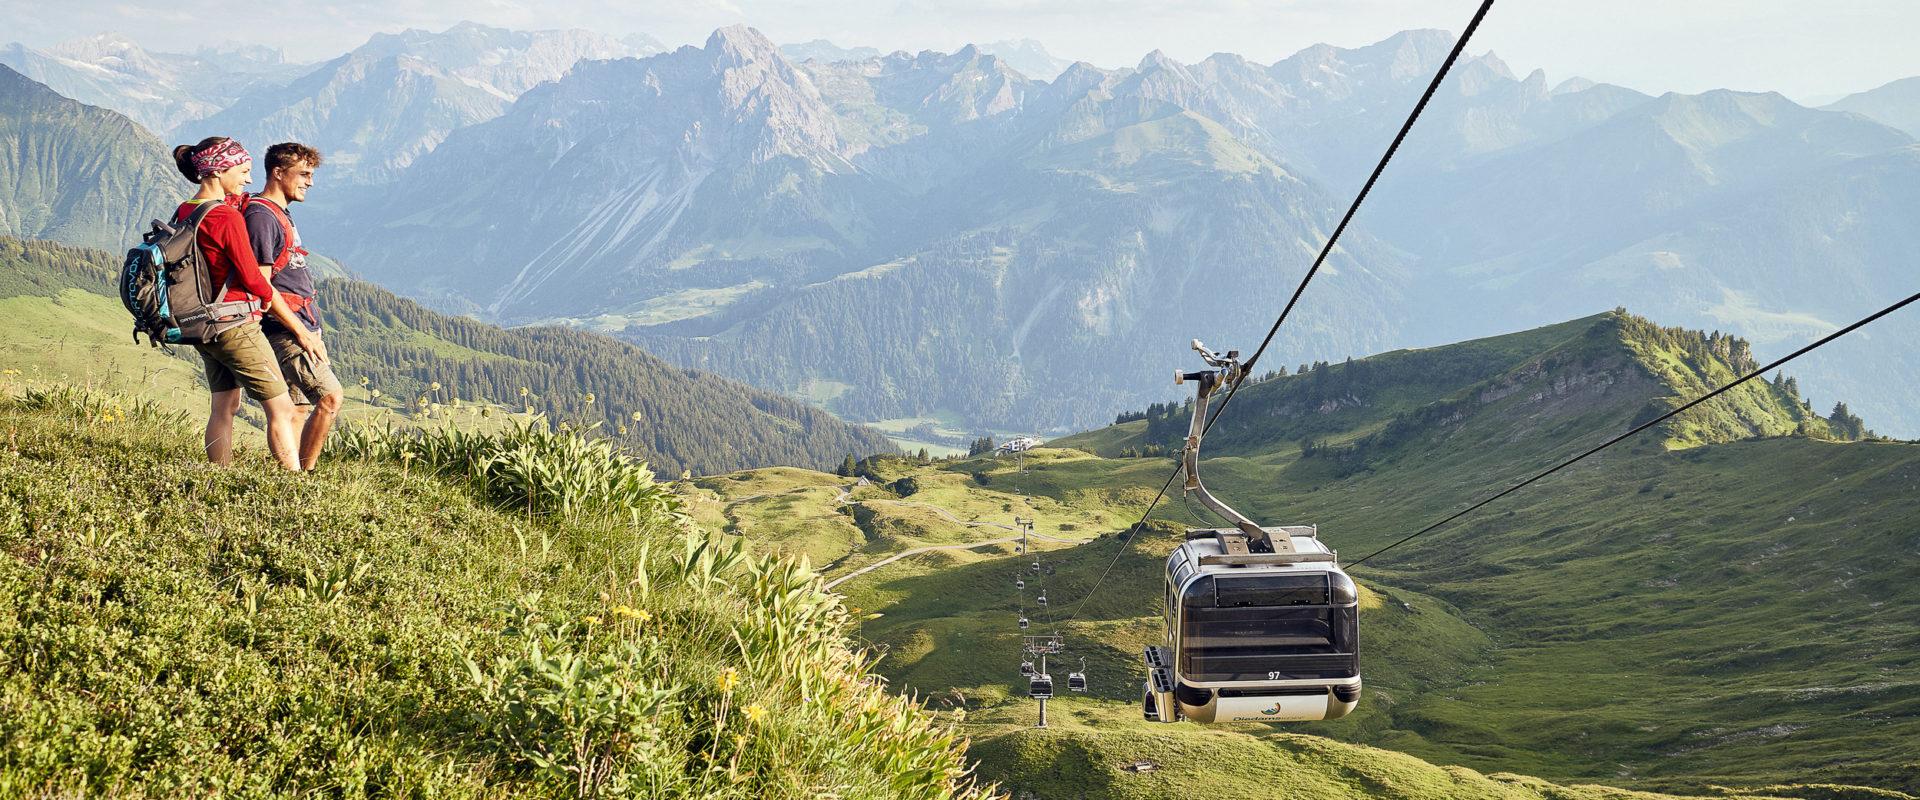 Bergbahnen Diedamskopf cable cars Au-Schoppernau